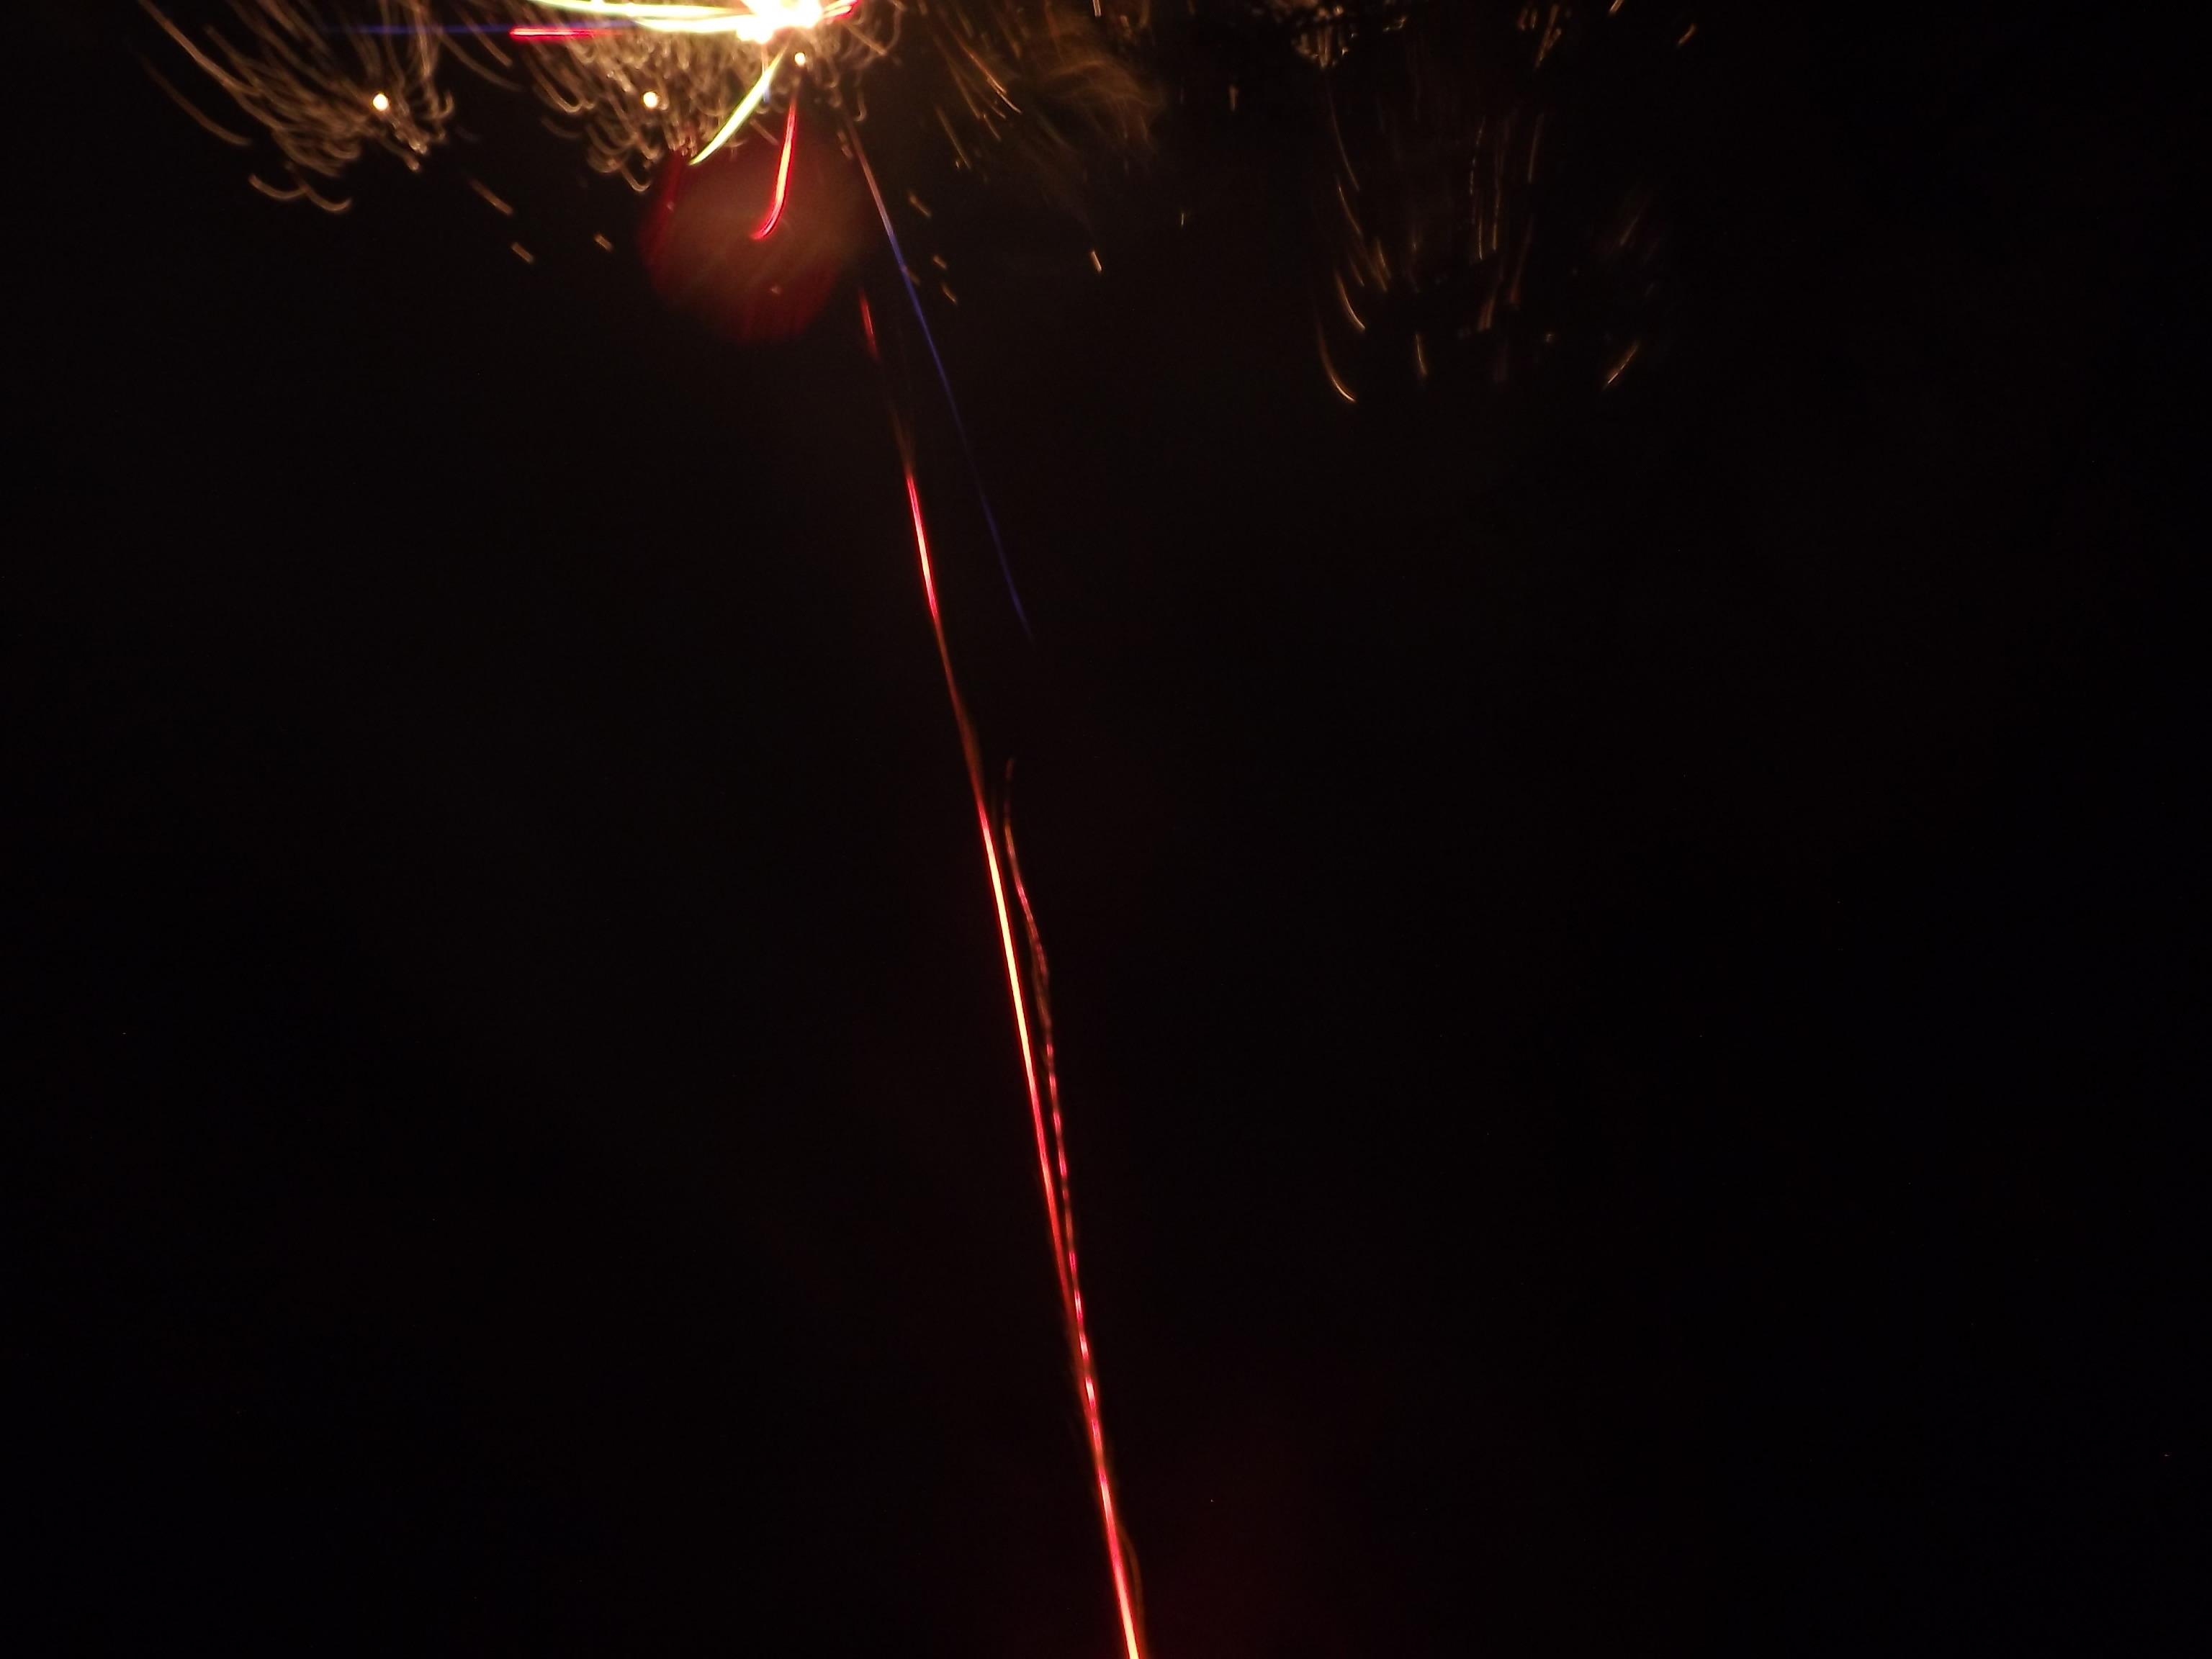 8325-feuerwerk-wolke-explosion